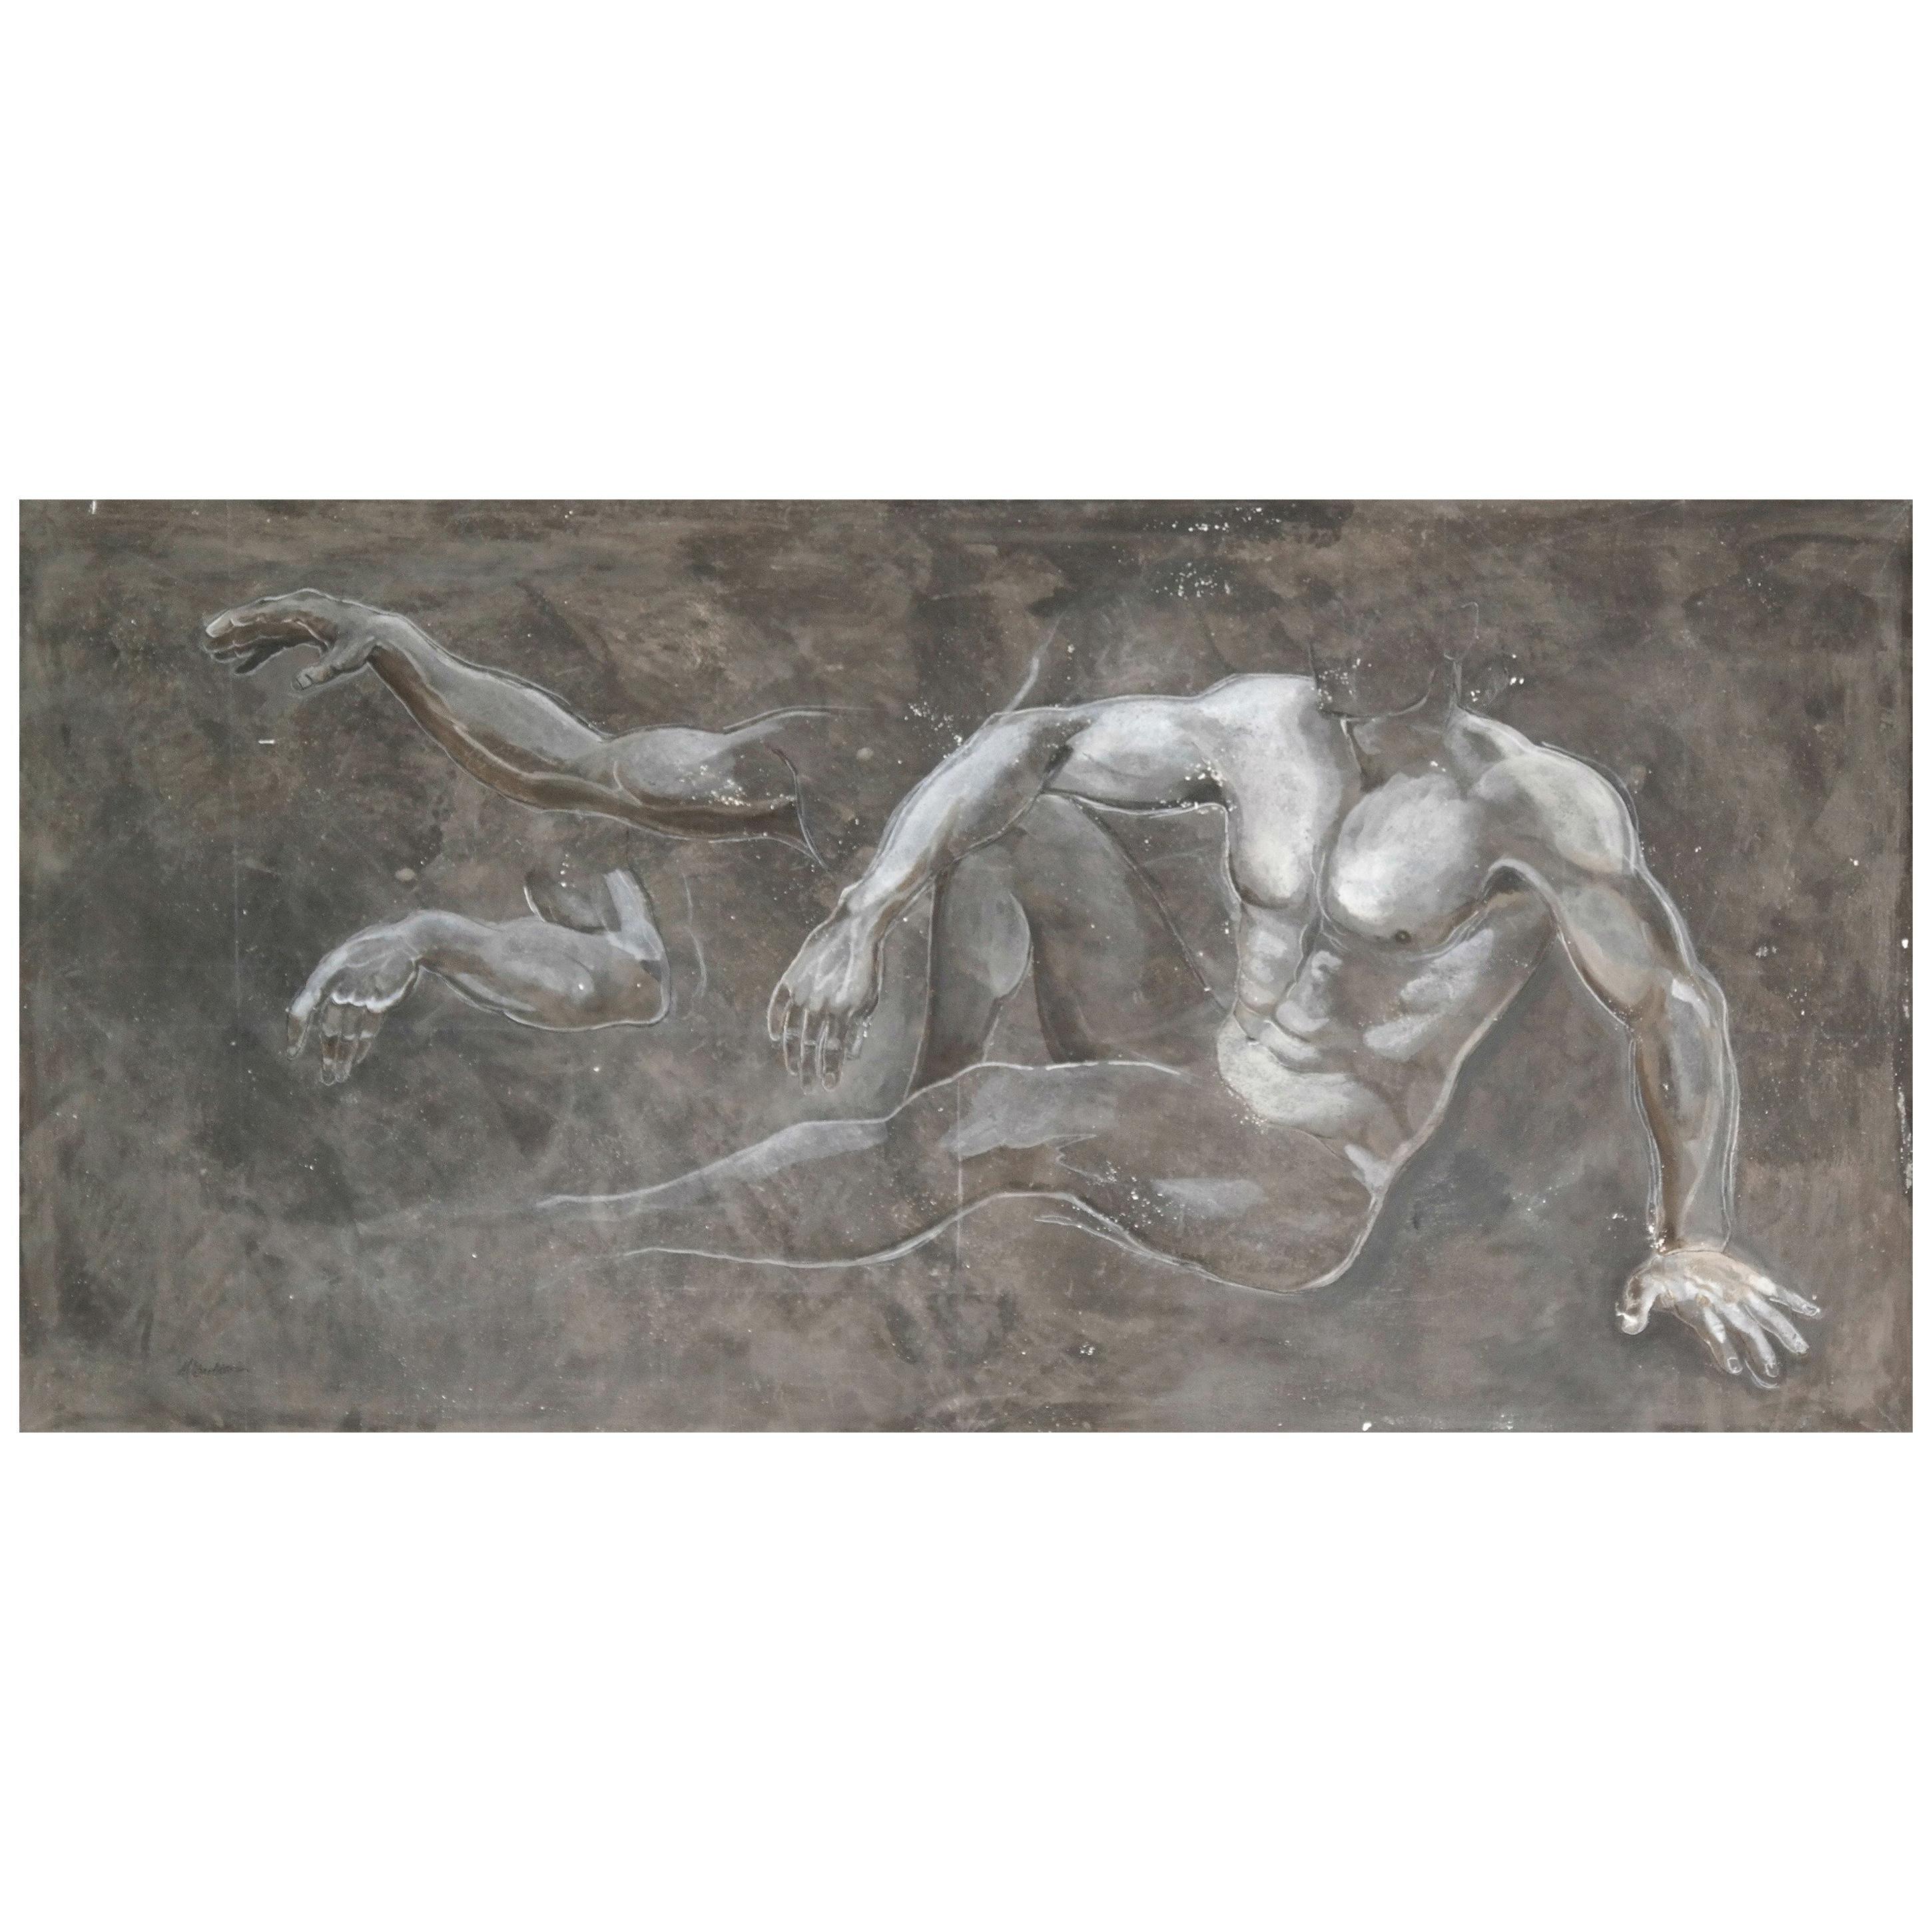 Study in Fresco - Fresco Painting of Male Torso by Melissa Barbieri